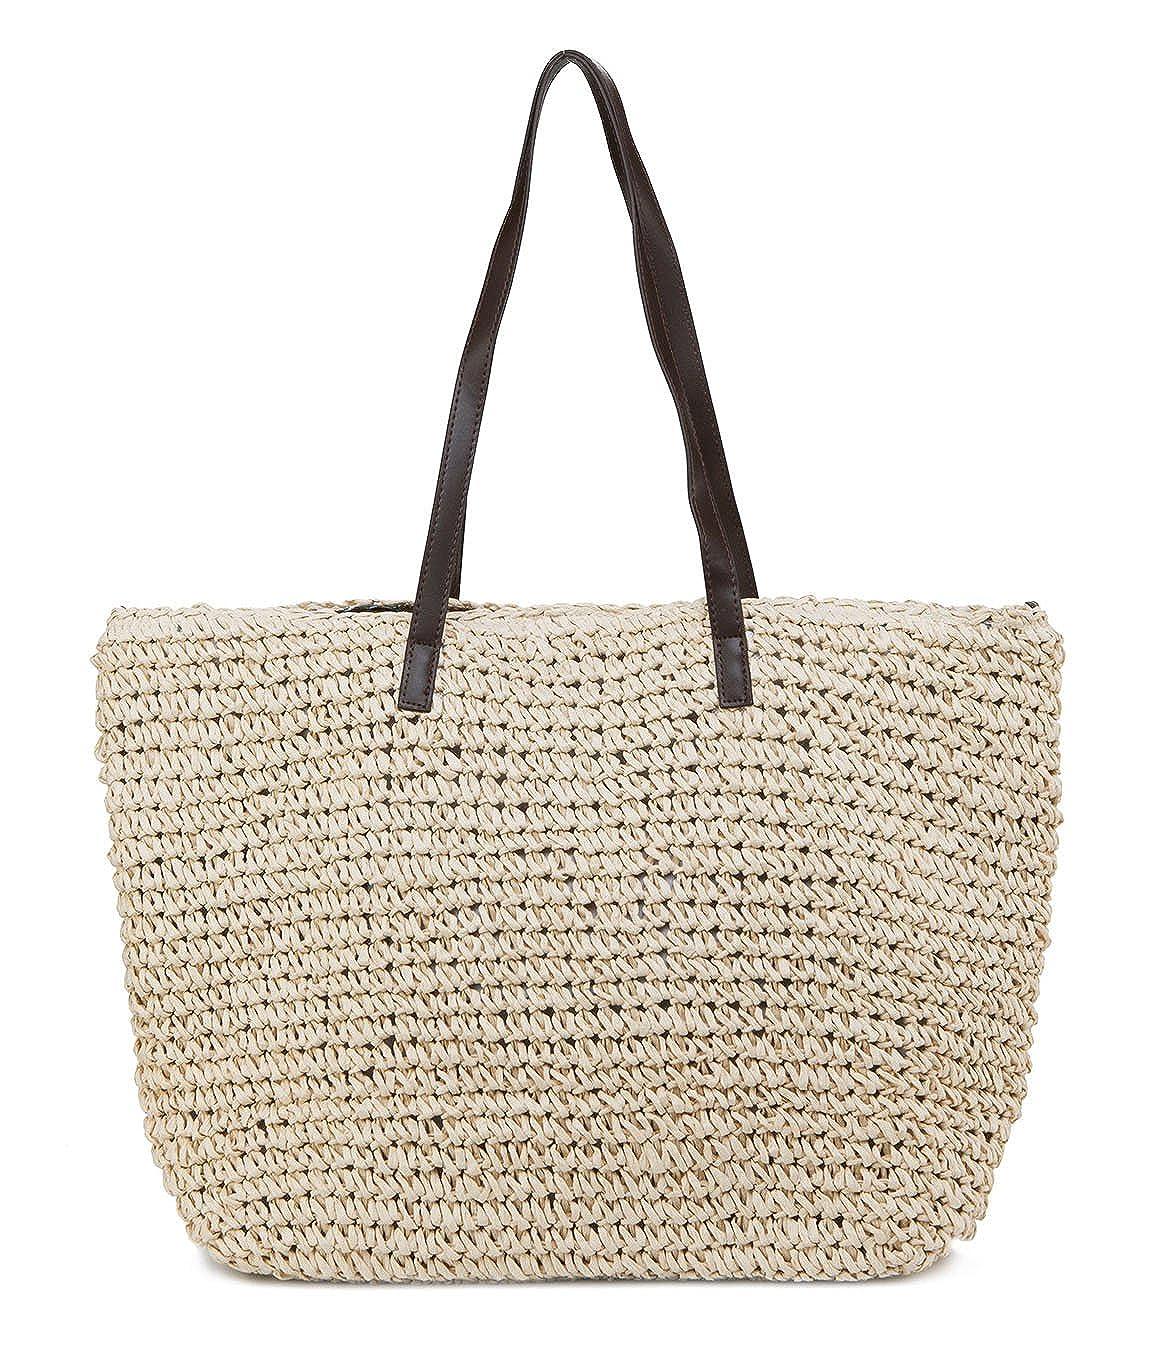 58e172ec5f Amazon.com  ILISHOP Hot Sale Women s Classic Straw Summer Beach Sea  Shoulder Bag Handbag Tote (Beige)  Shoes